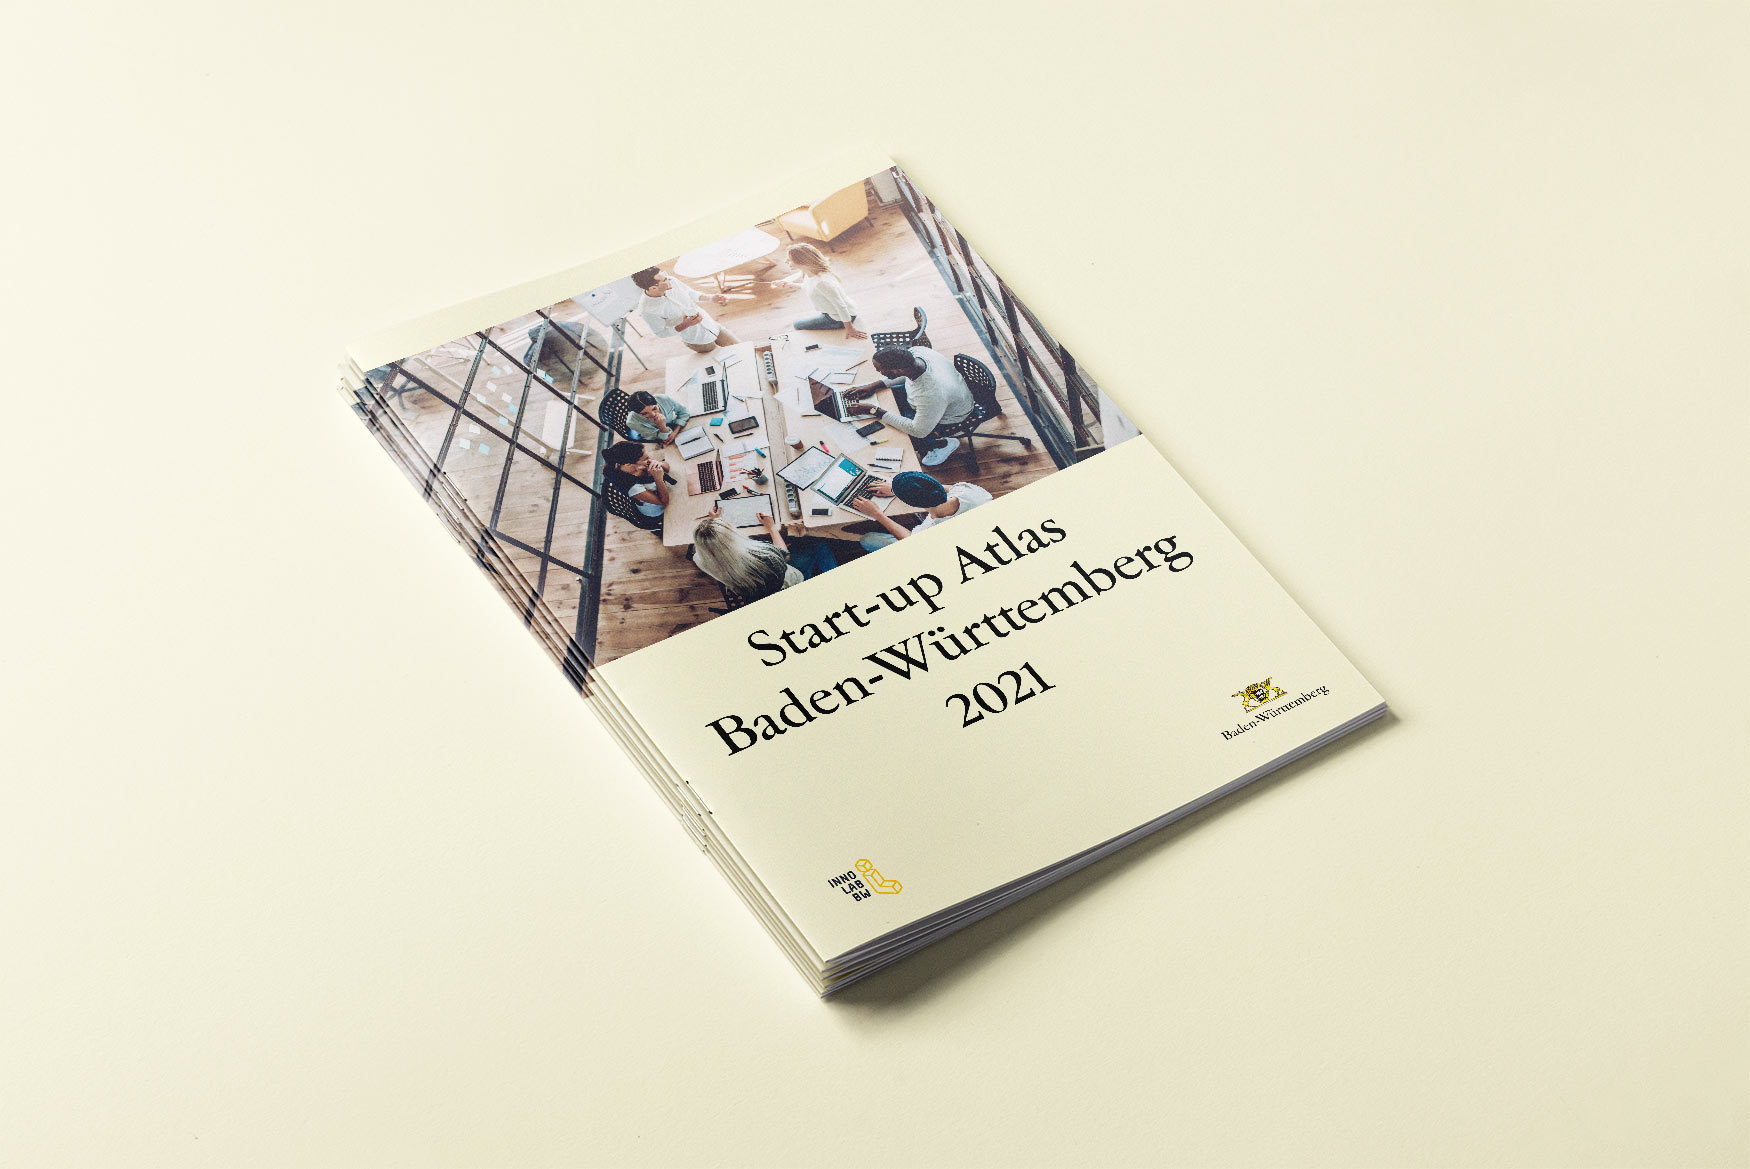 Editorial-Design-innolab-1-Designagentur-Stuttgart-Kreativbetrieb